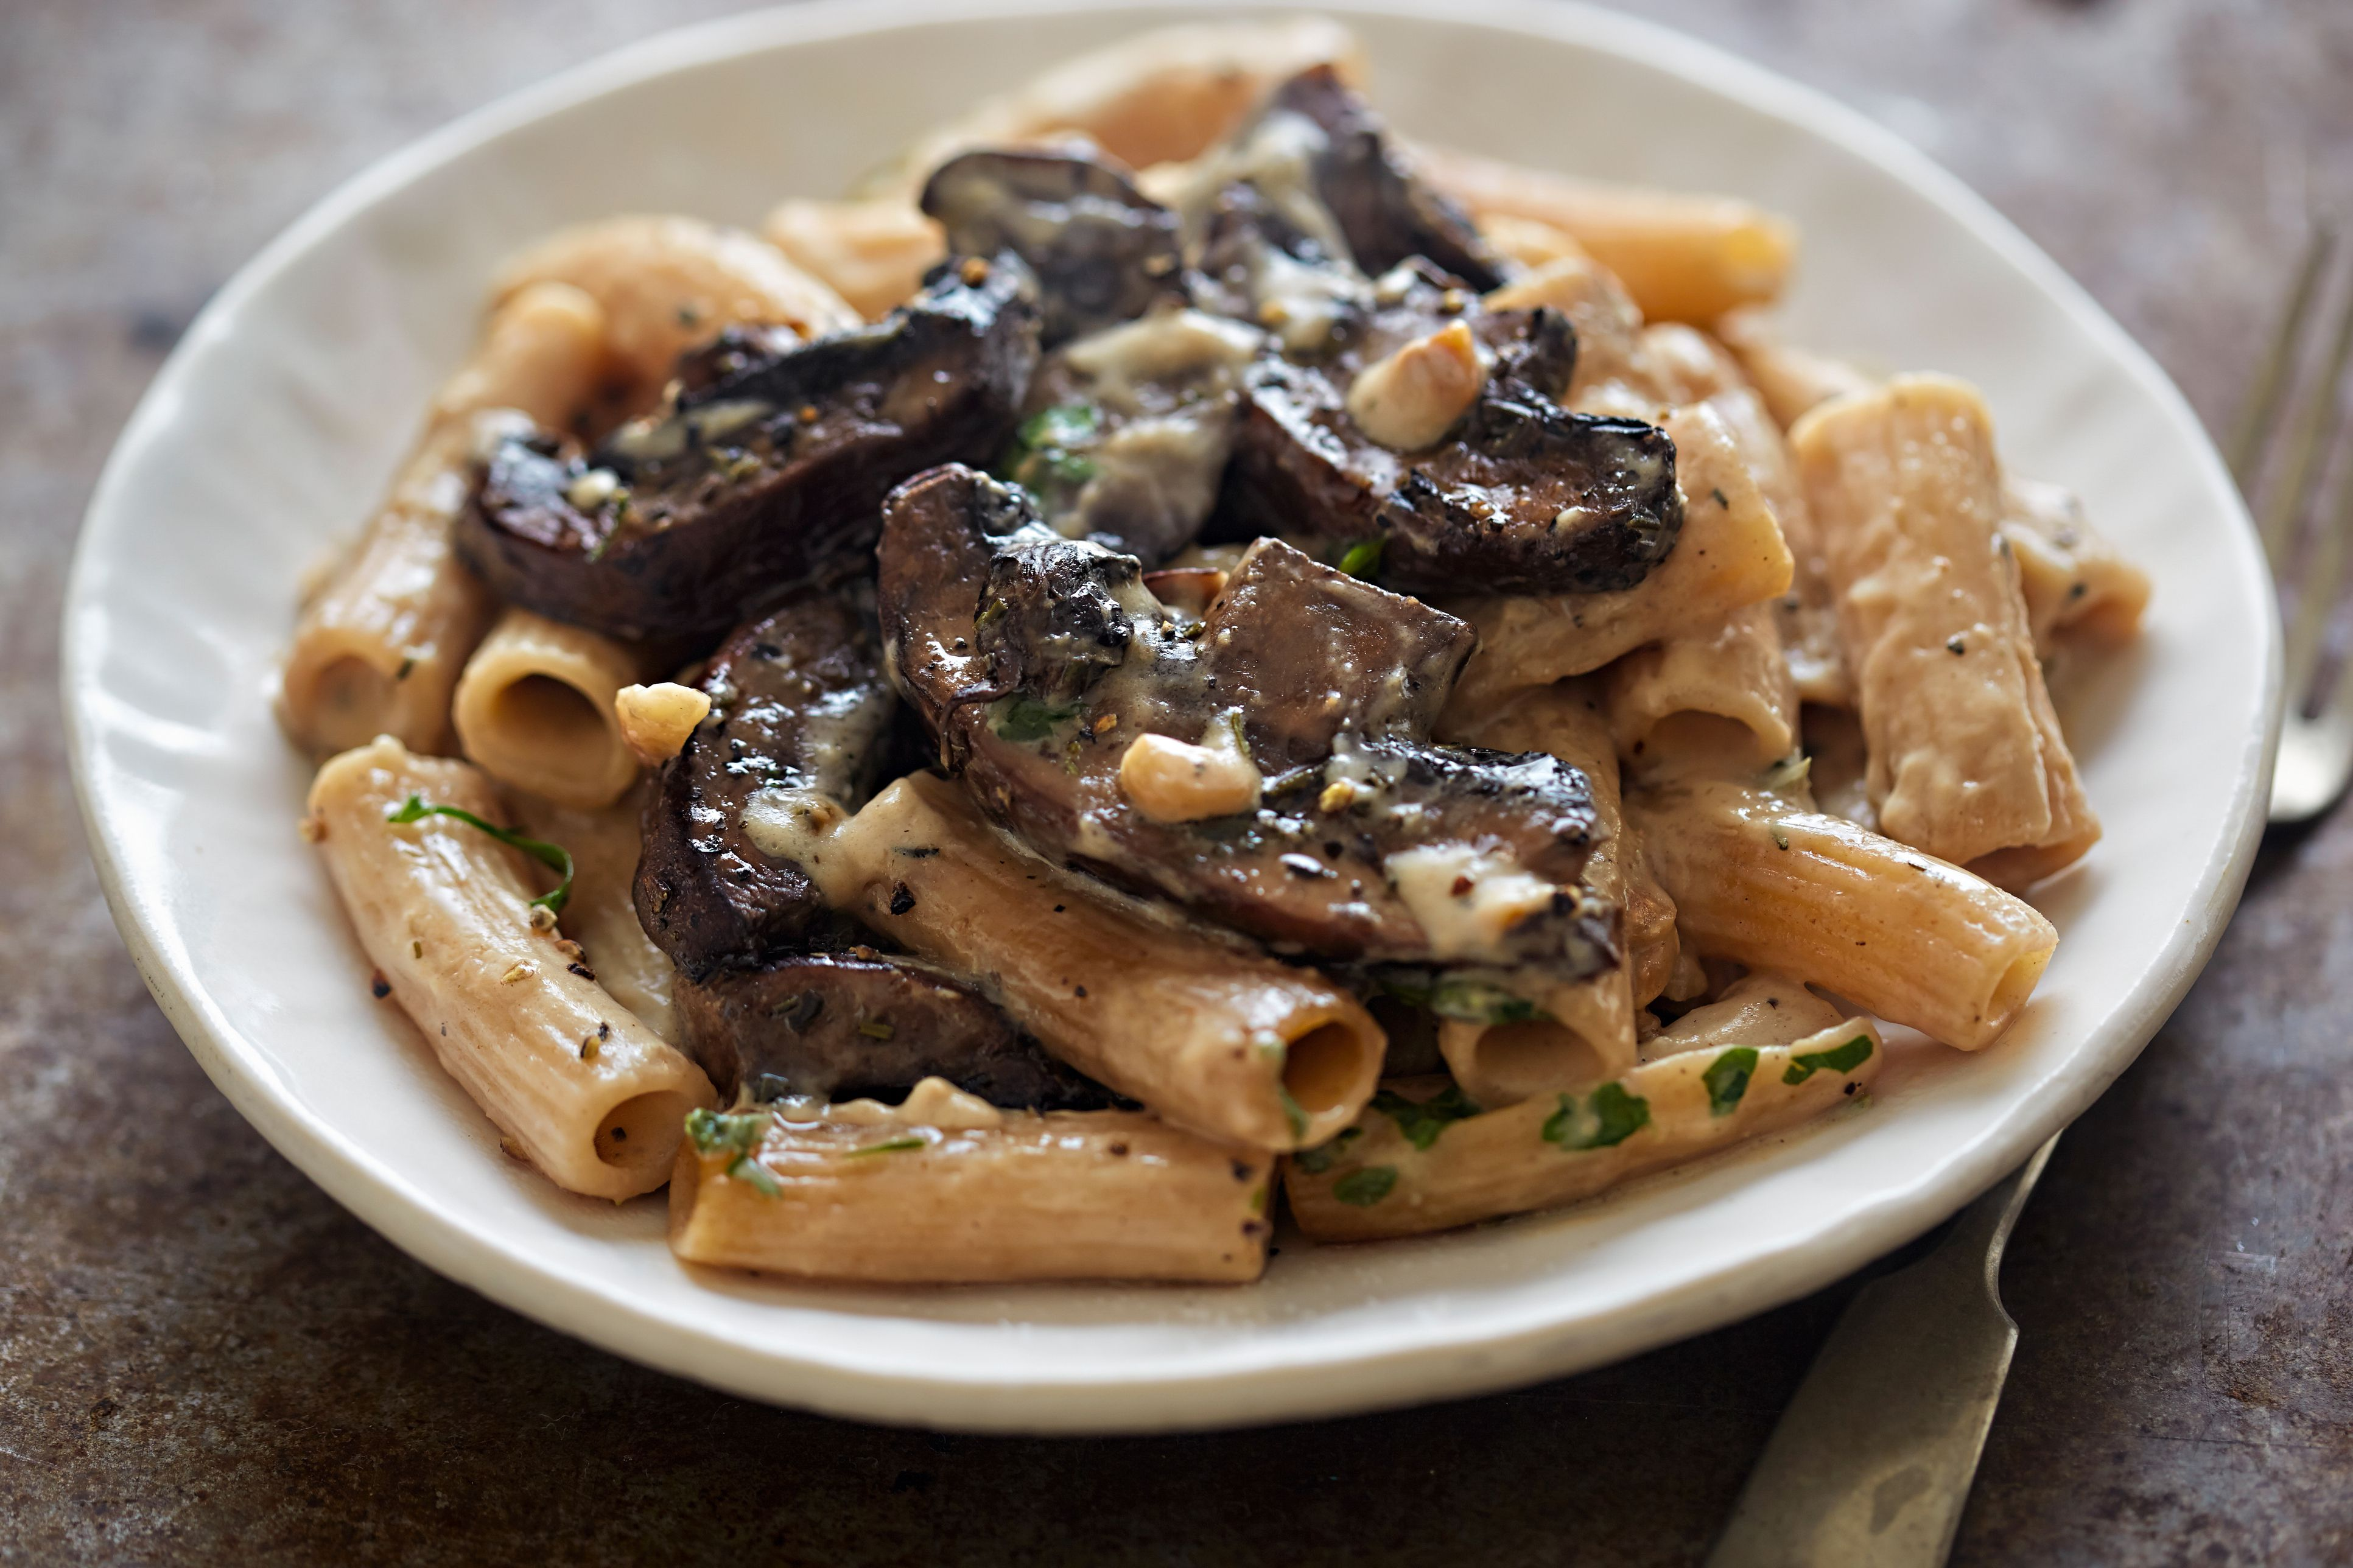 Pasta rigatoni with mushroom sauce and nuts